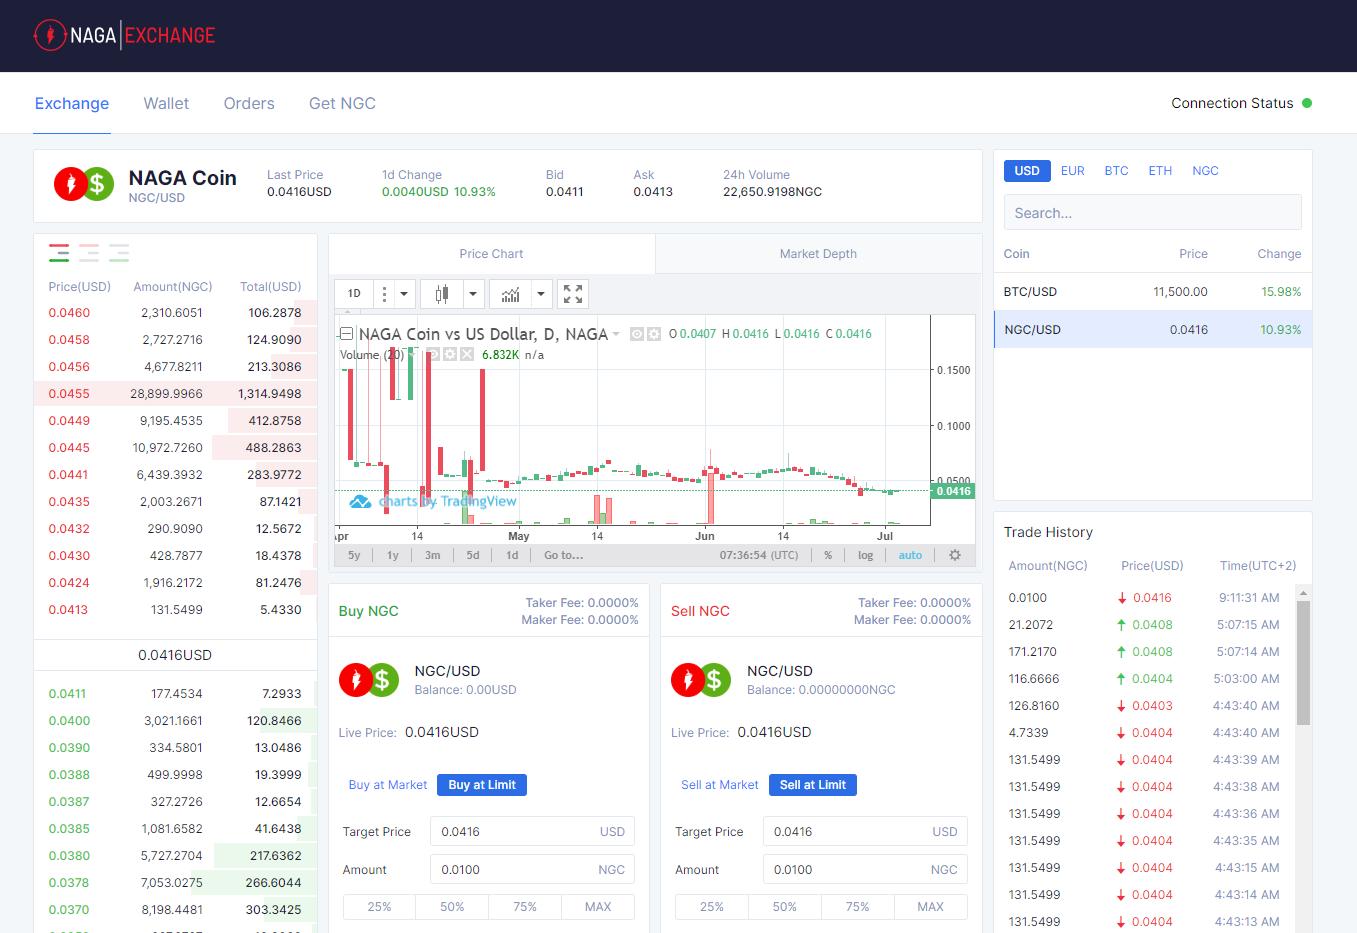 NAGAX Trading View